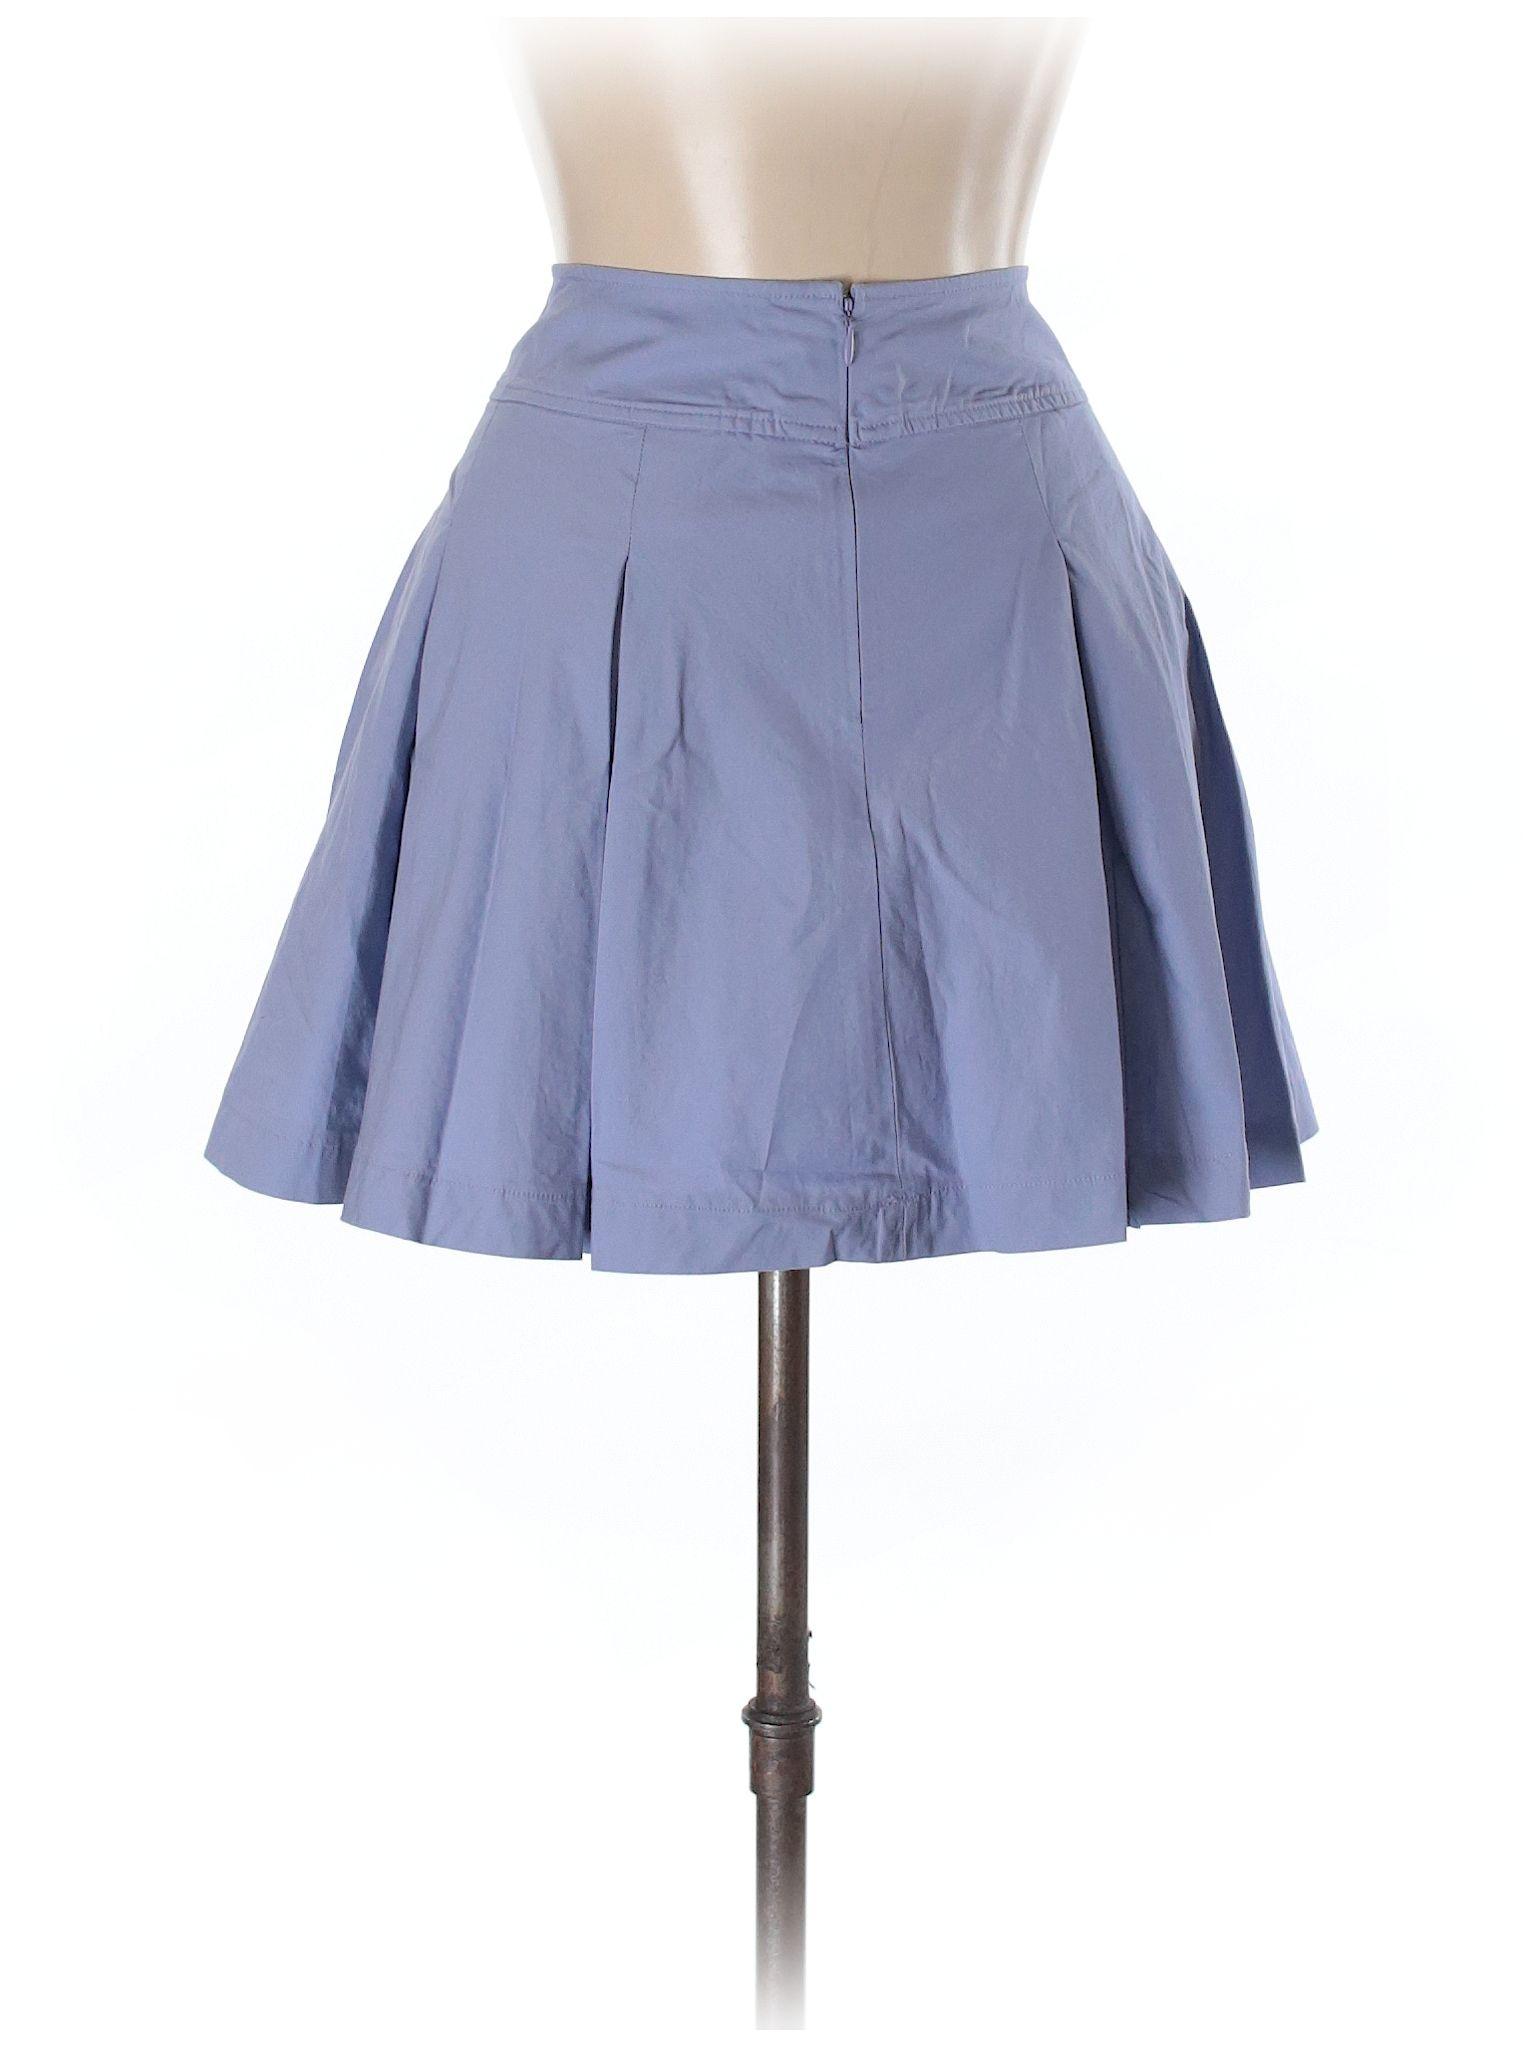 Subtle Flavor Women Mermaid Skirt High Waist Fishtail Hem Solid Bodycon Pencil Midi Skirts